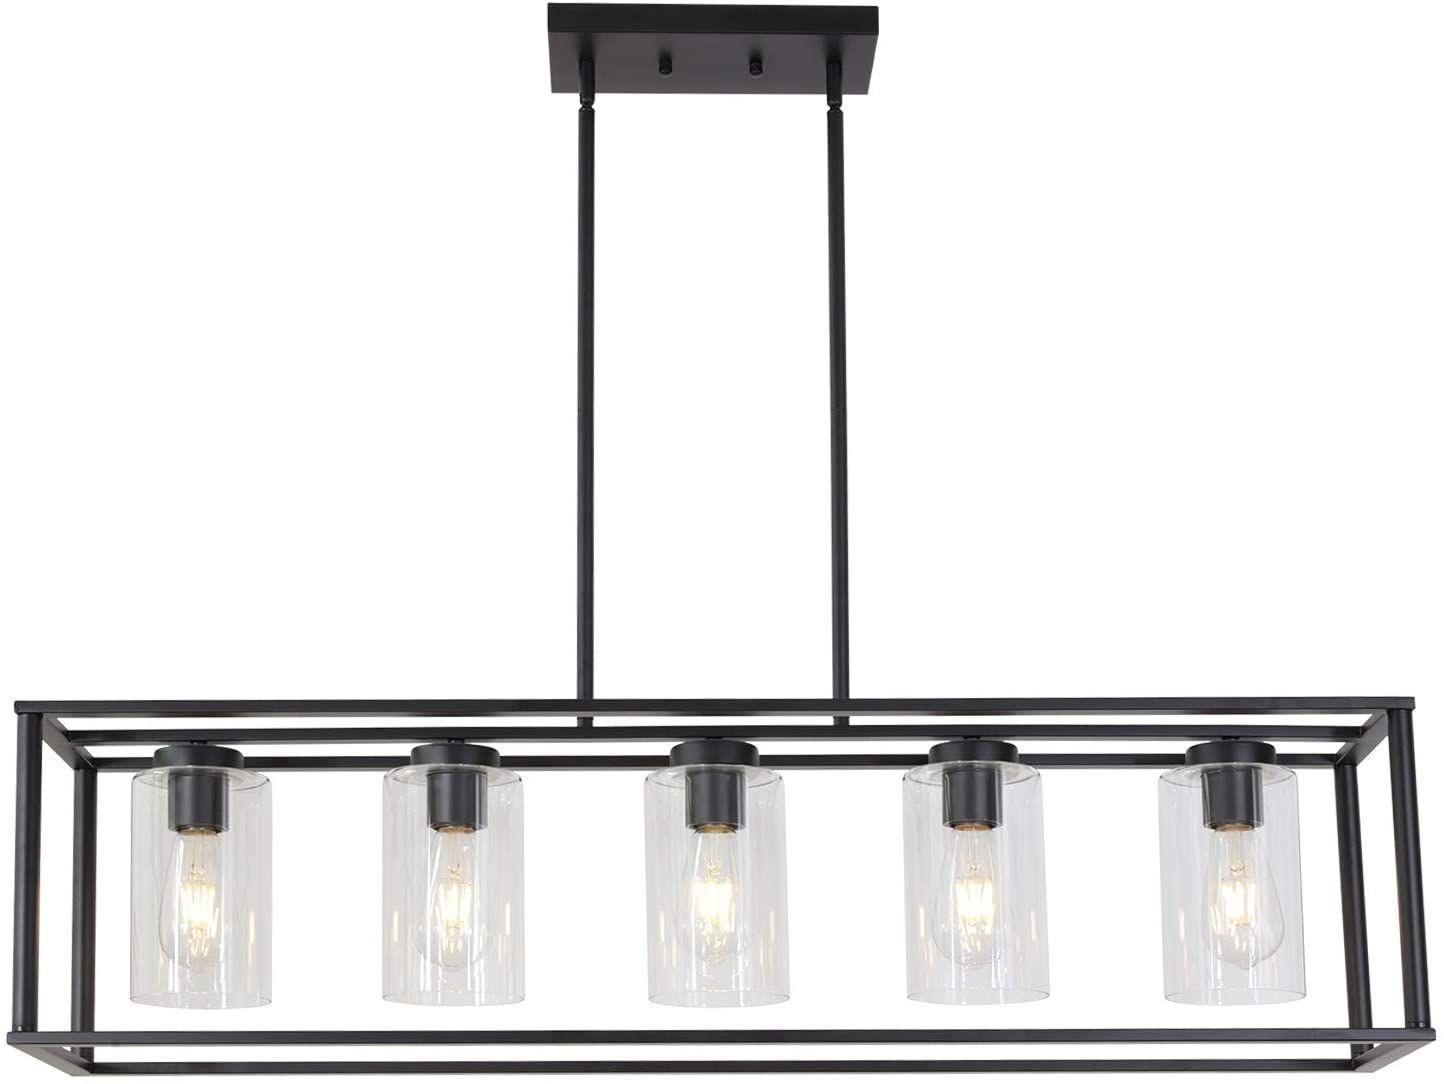 Vinluz Contemporary Modern Chandeliers Rectangle Black 5 Light Dining Room Lightin In 2020 Dining Light Fixtures Dining Room Lighting Modern Dining Room Light Fixtures